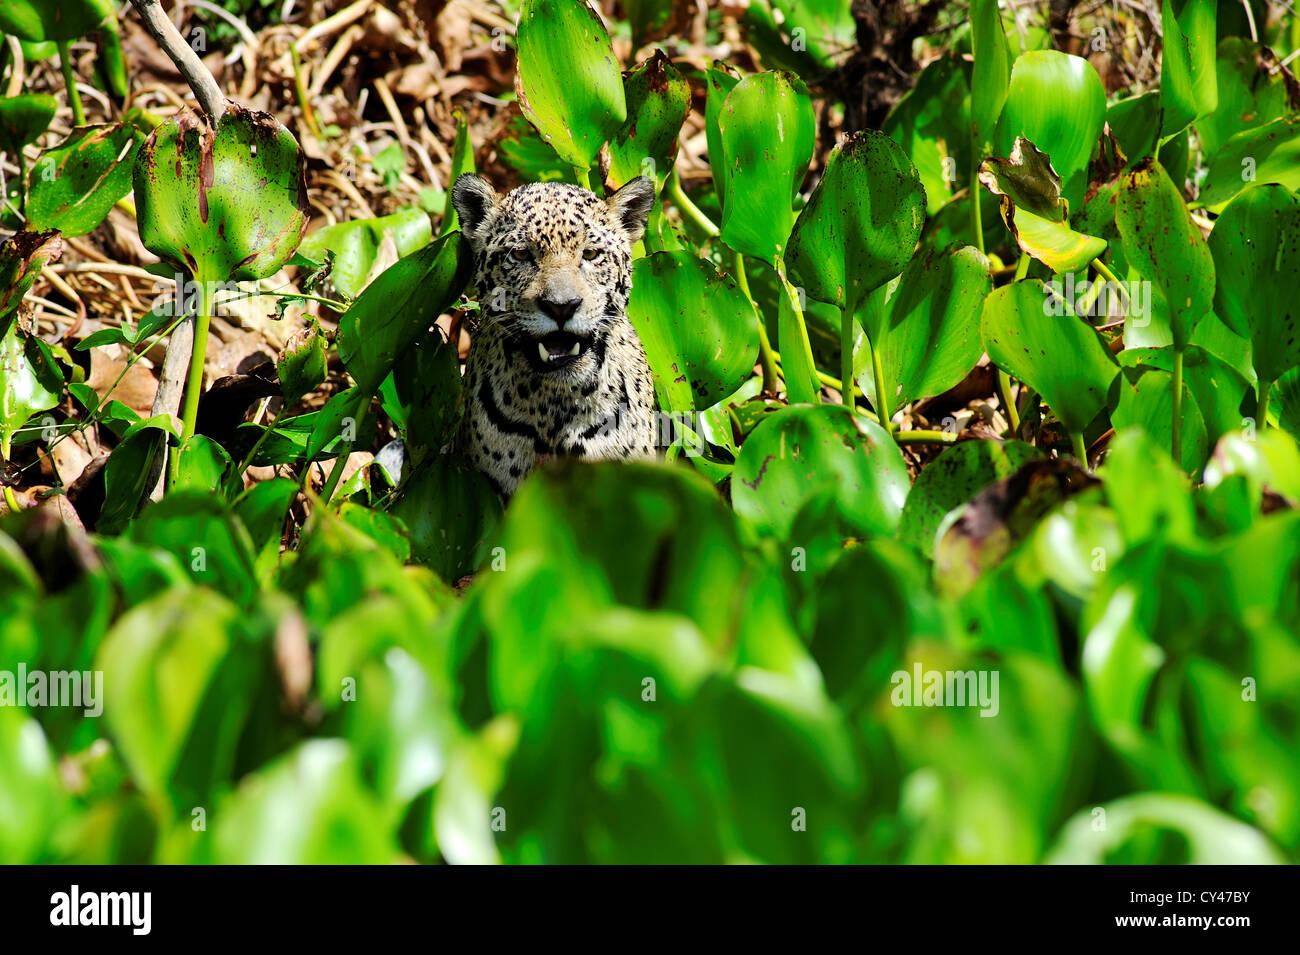 Jaguar an den Ufern des Flusses Cuiabá Pantanal von Mato Grosso in Brasilien Zustand. Stockbild